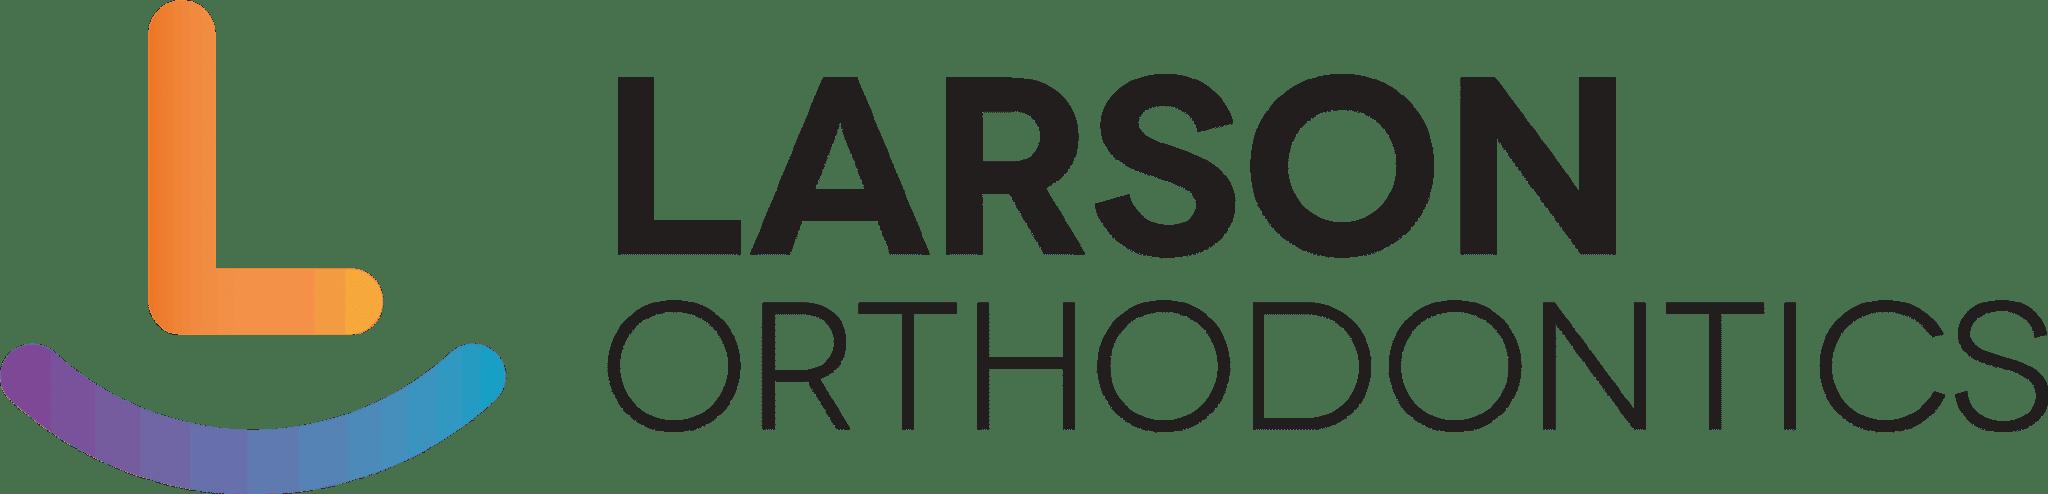 Larson Orthodontics in Alexandria, VA